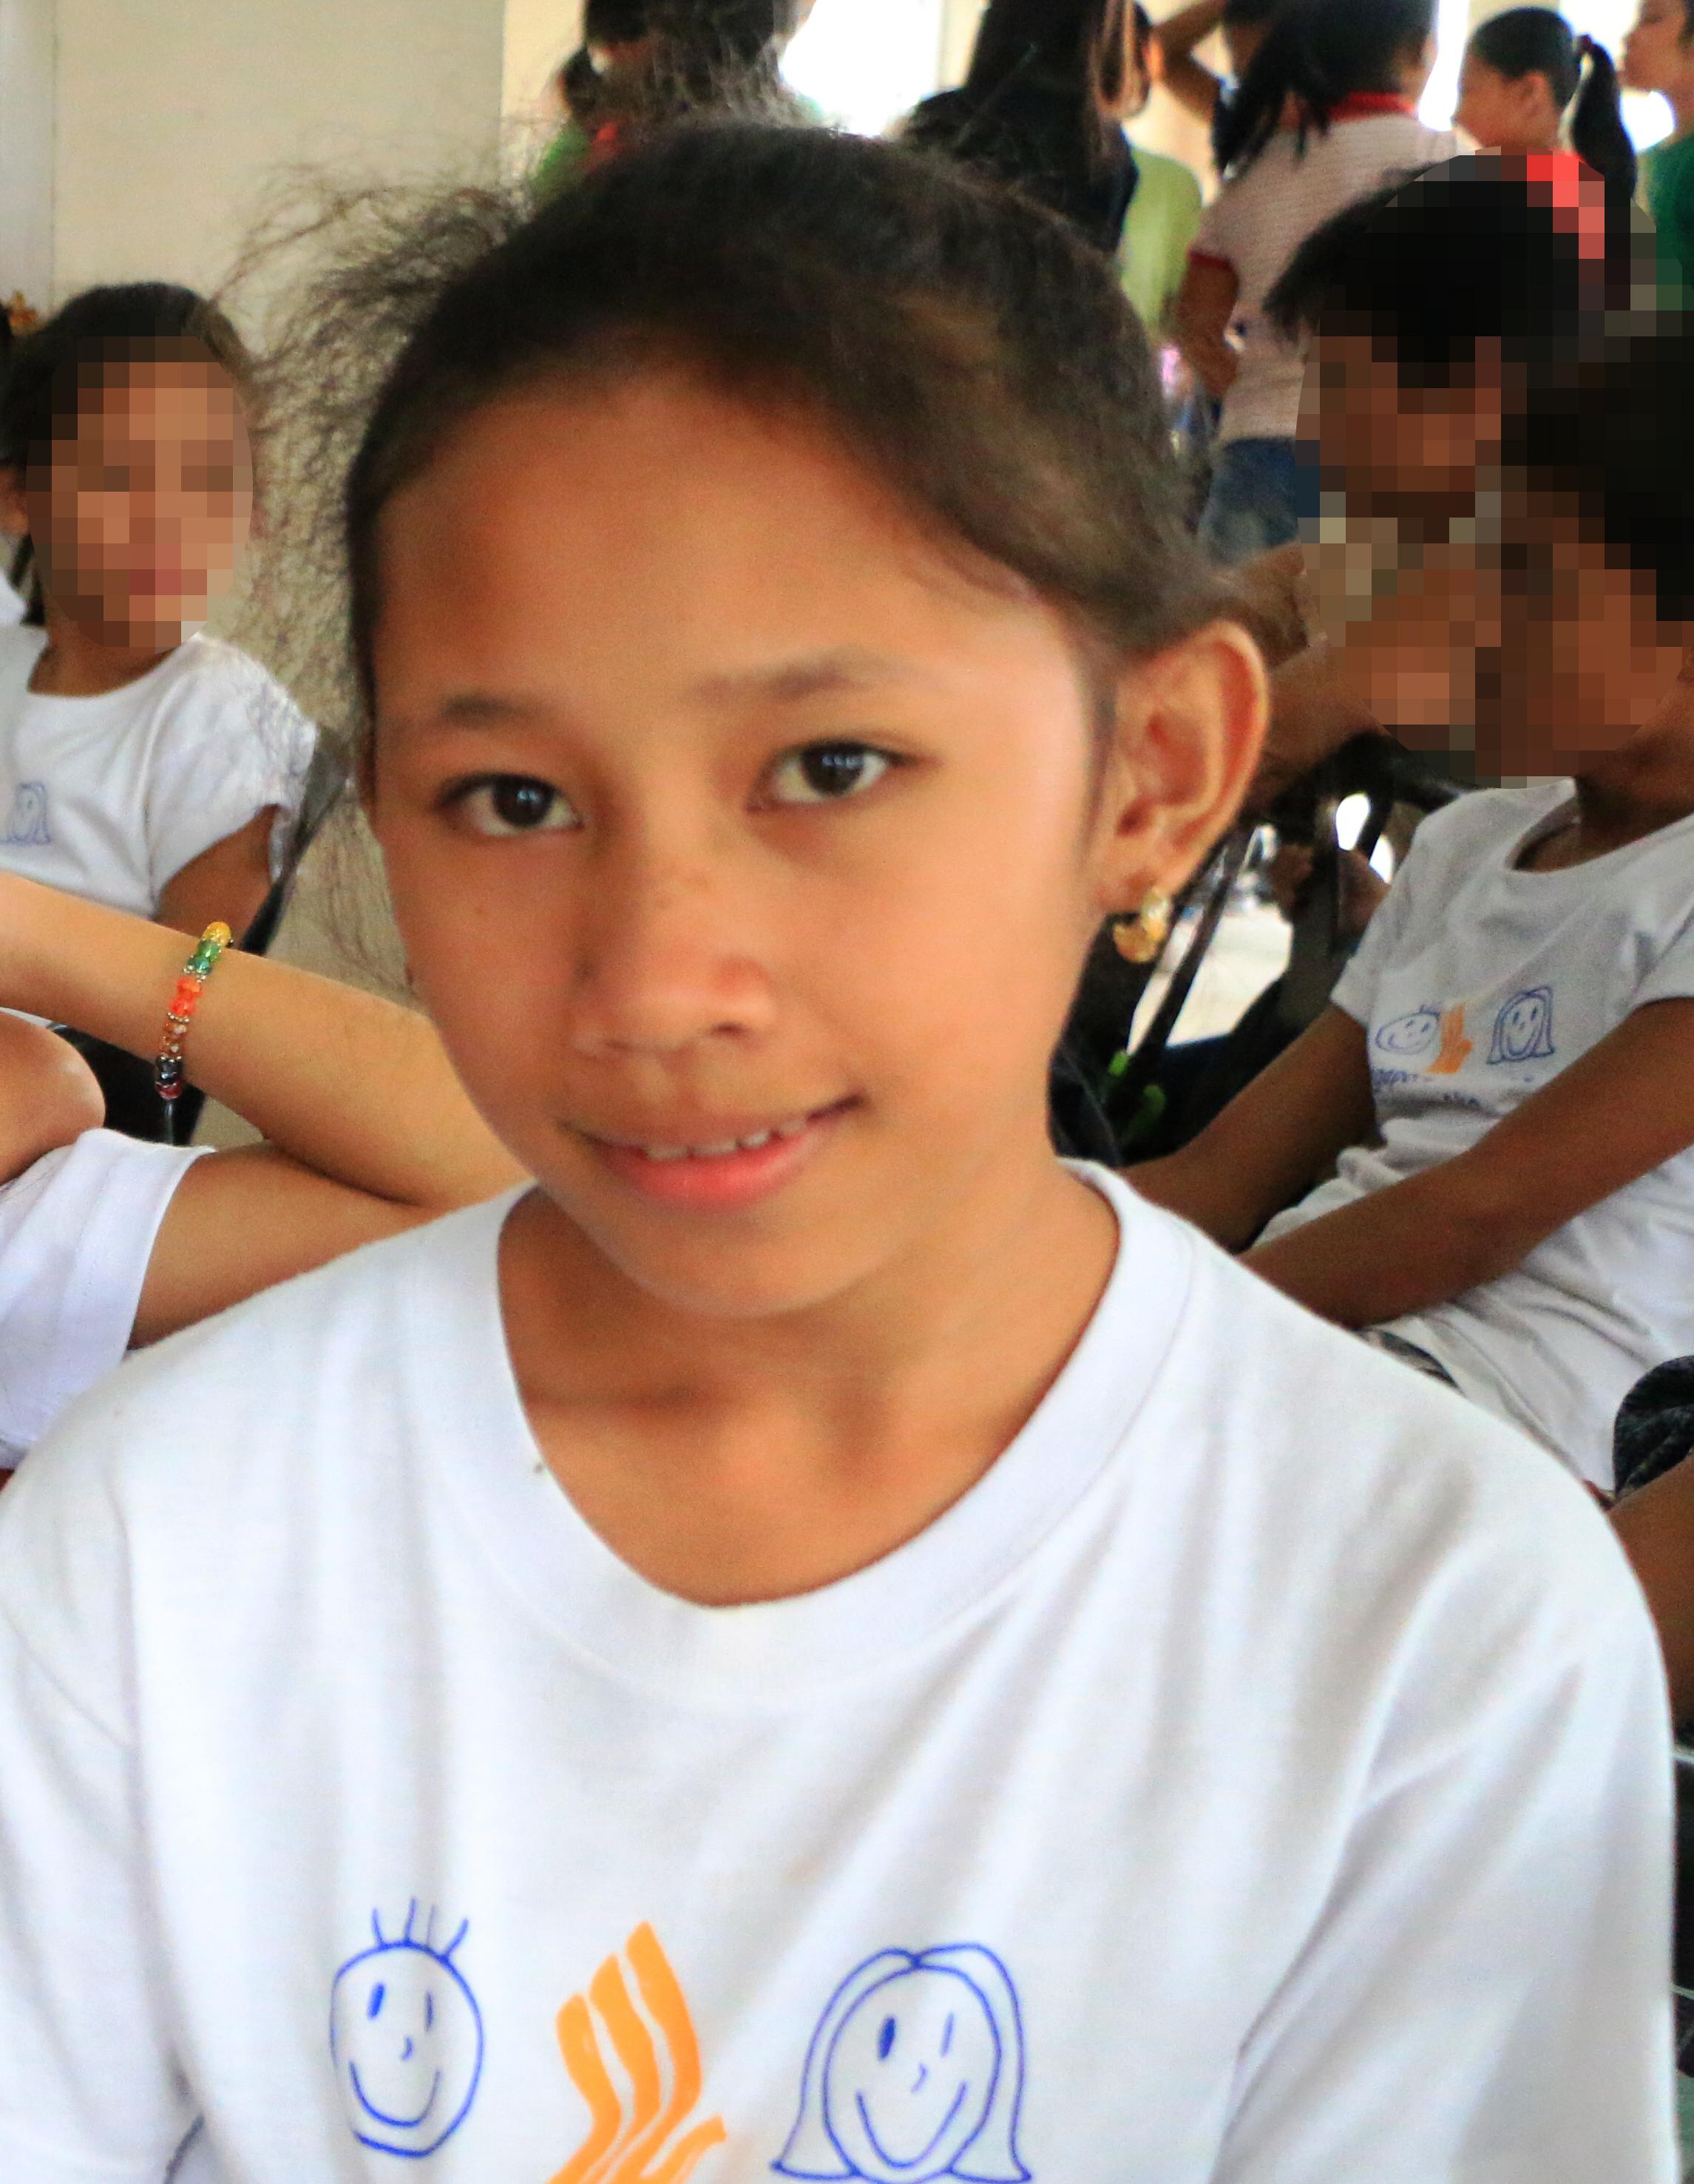 Alyssa Marie Gerolao, Bantay Bata 163 scholar